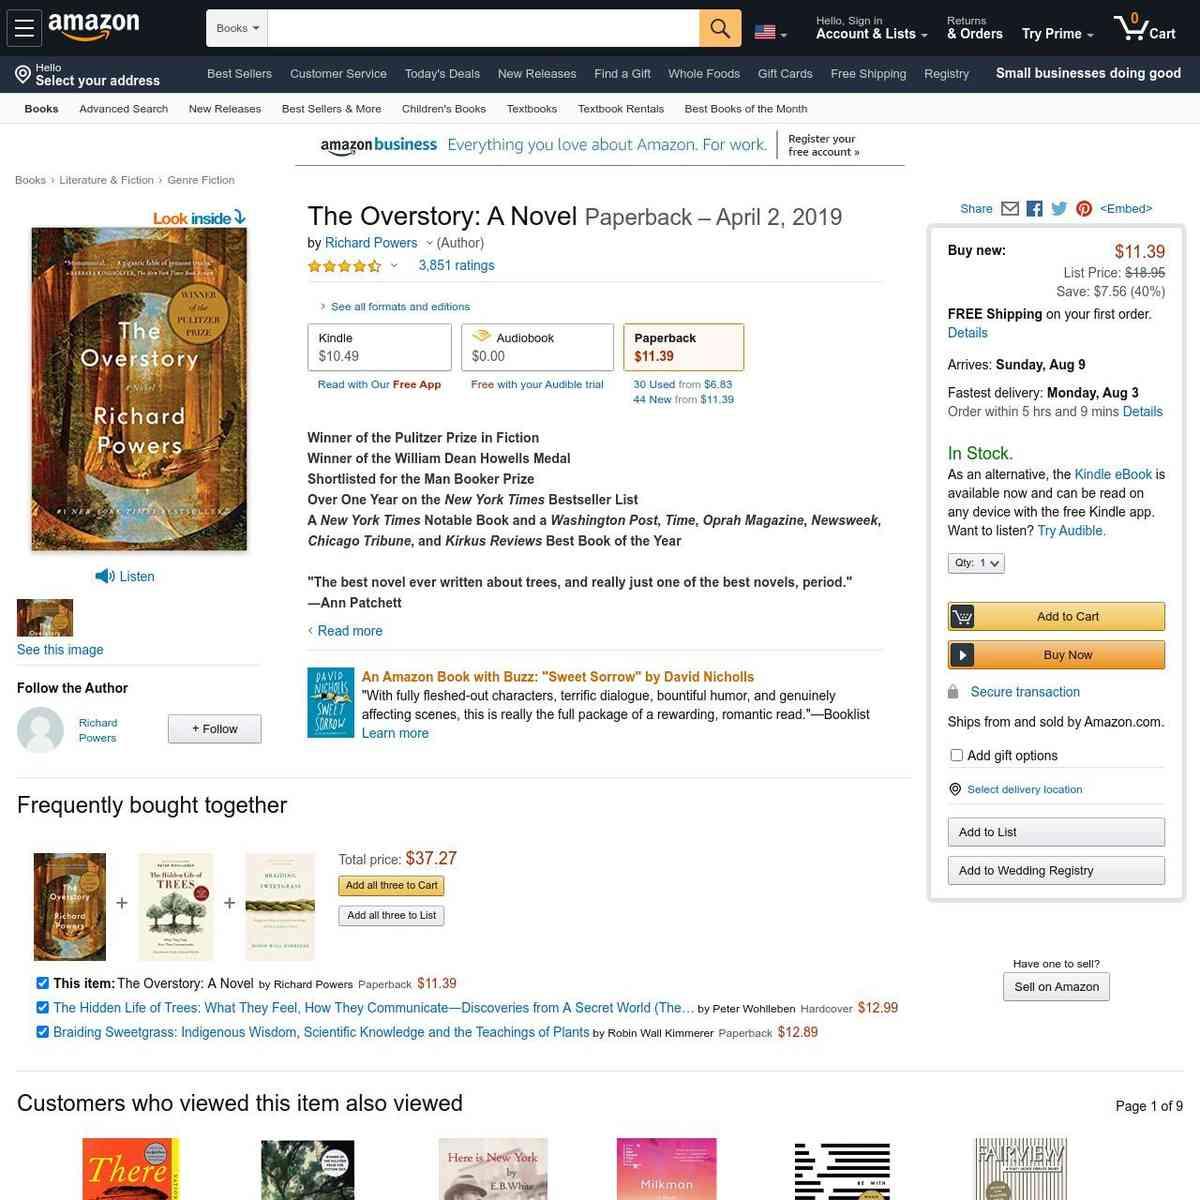 amazon.com/Overstory-Novel-Richard-Powers/dp/039335668X/ref=nodl_